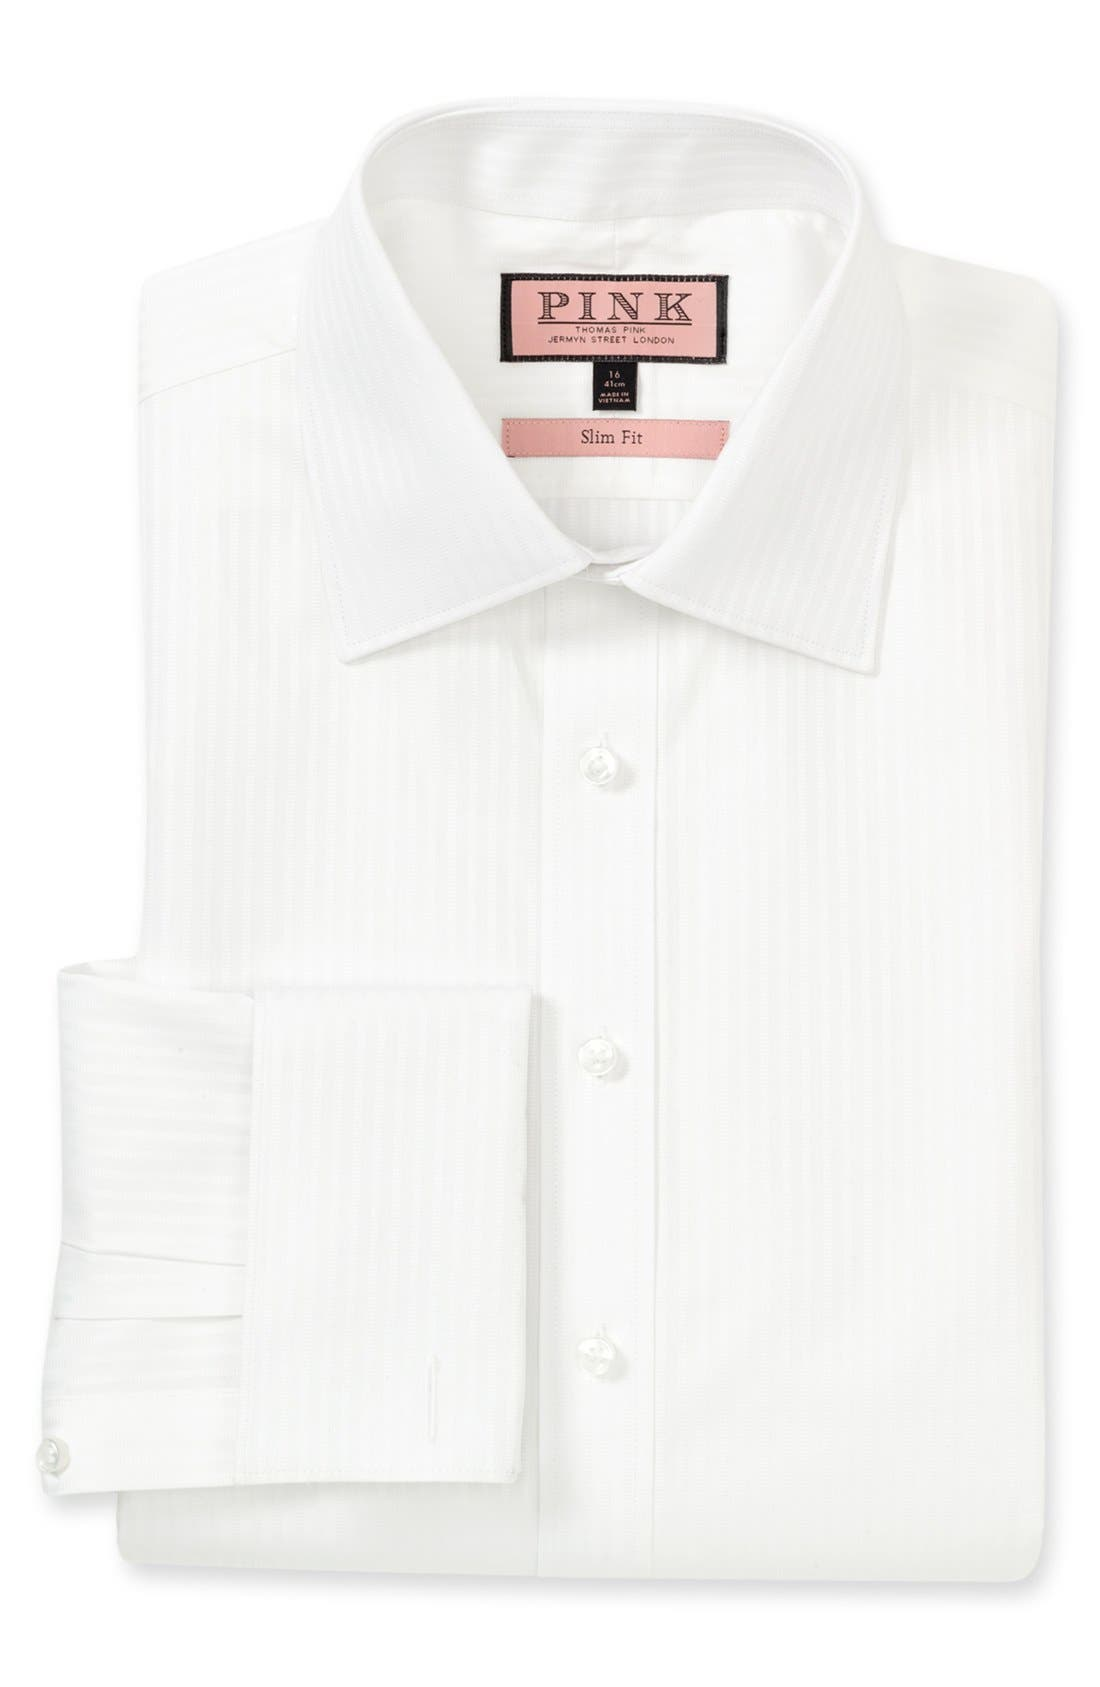 Main Image - Thomas Pink 'Steve' Stripe Cotton Slim Fit Dress Shirt